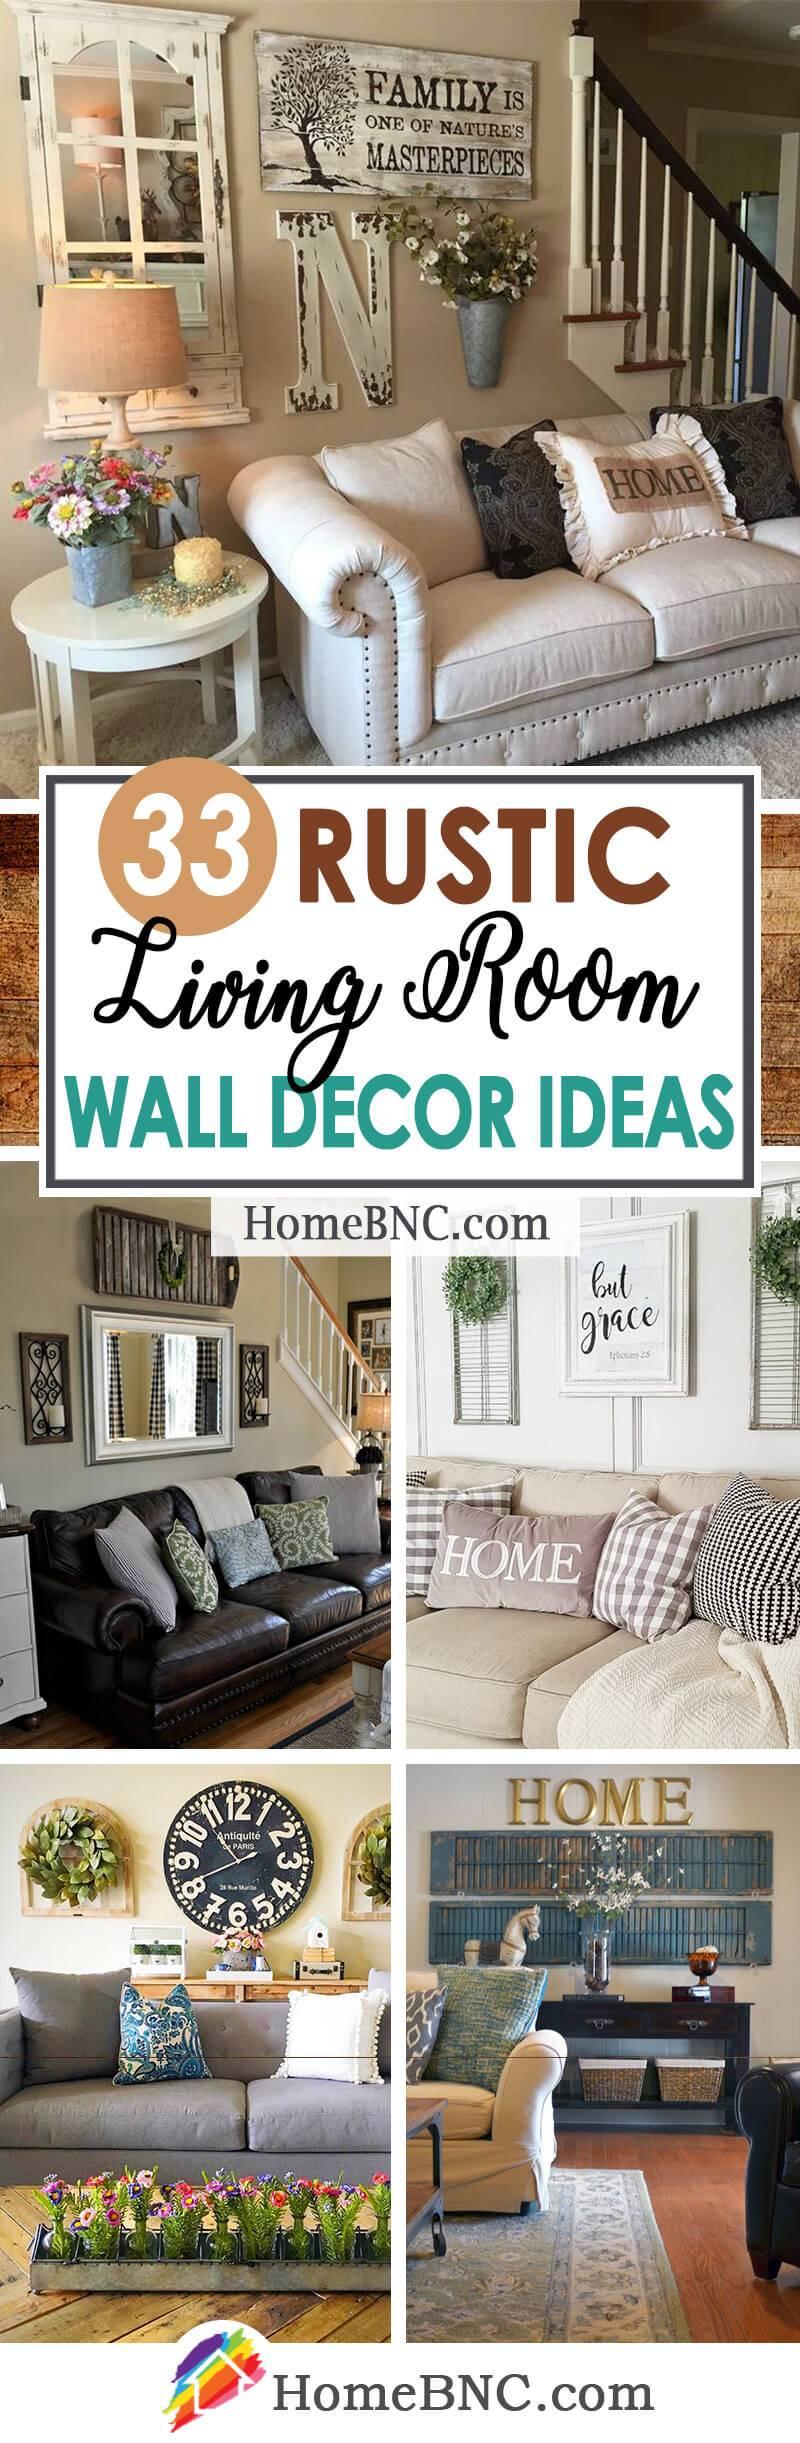 rustic living room wall decor ideas pinterest share homebnc